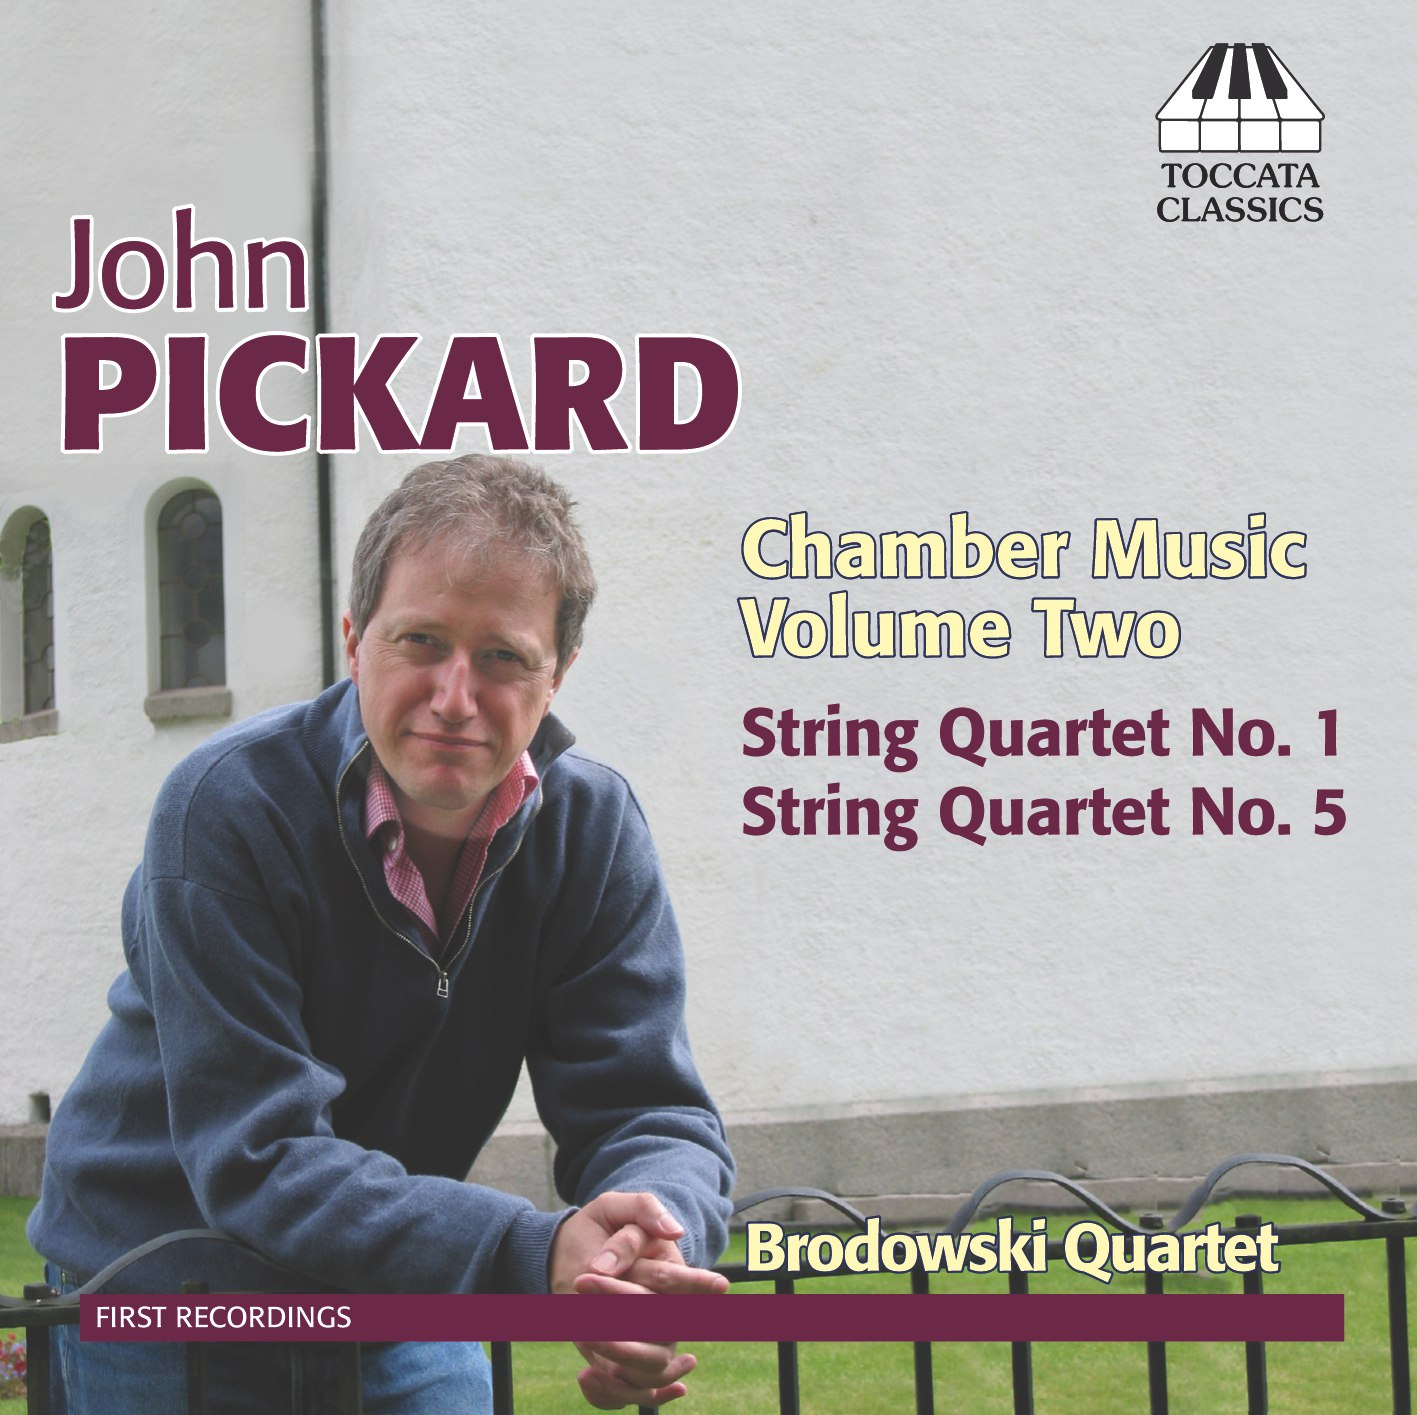 John Pickard: Chamber Music Volume Two